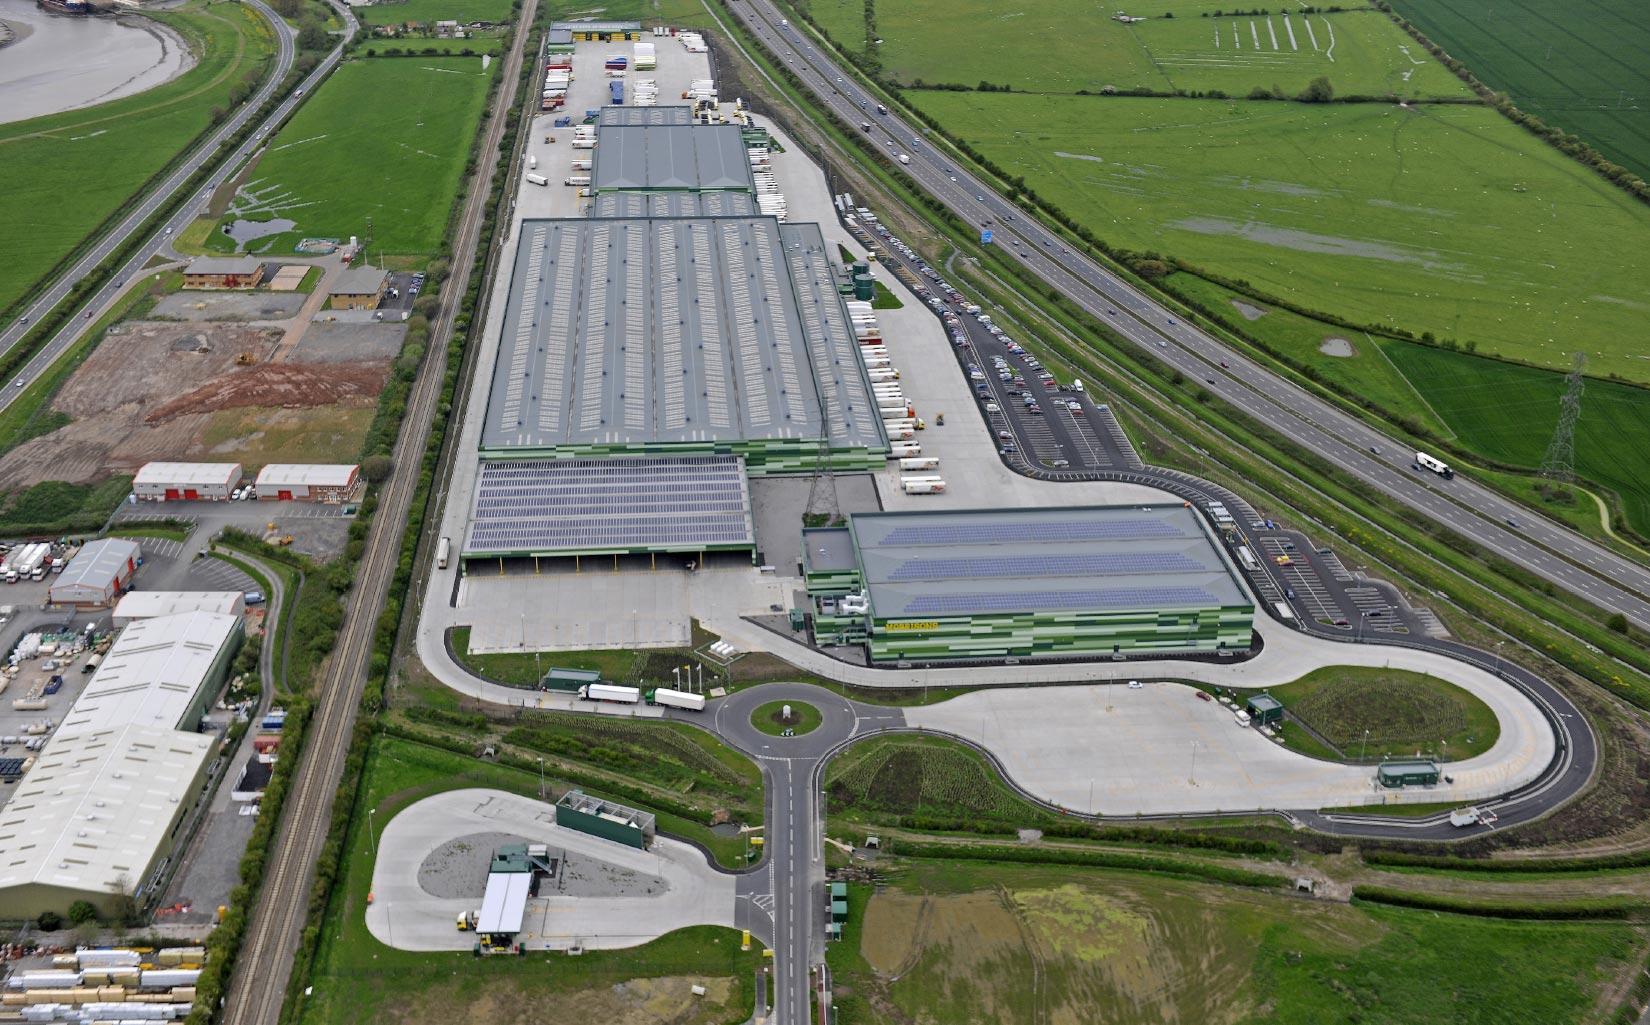 Morrison Distribution Centre, Bridgwater, Aerial